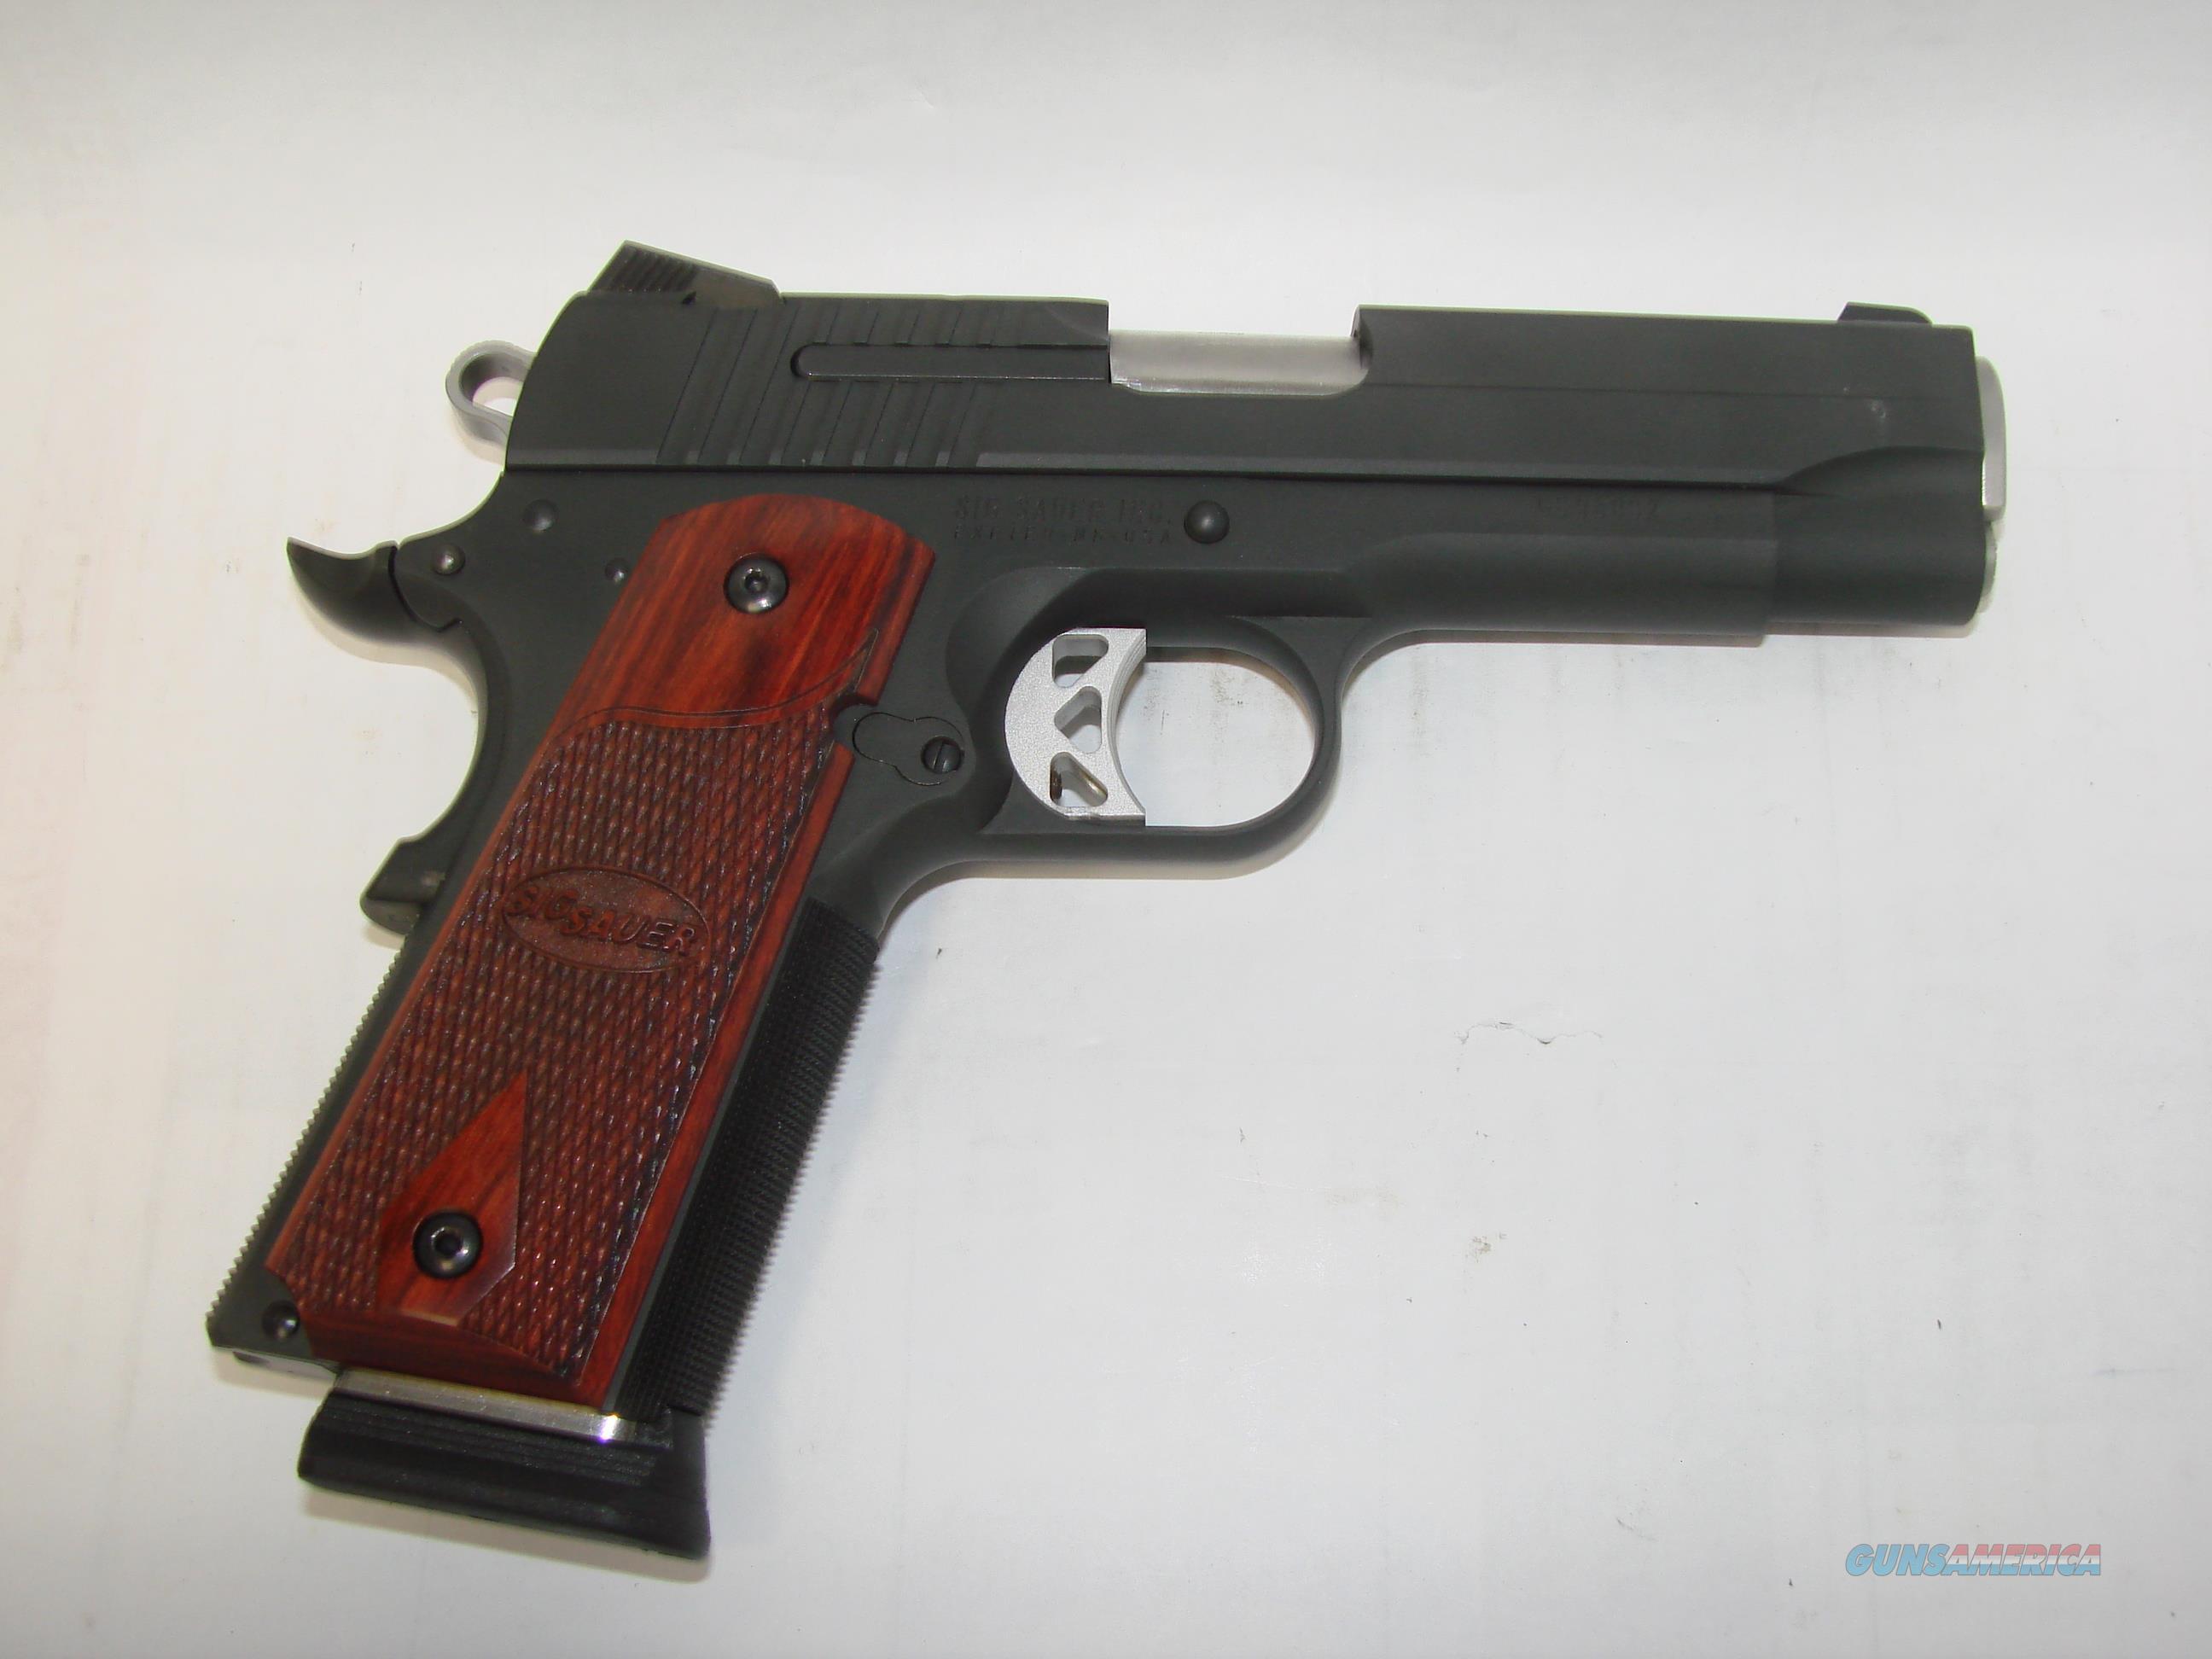 Sig 1911  Guns > Pistols > Sig - Sauer/Sigarms Pistols > 1911